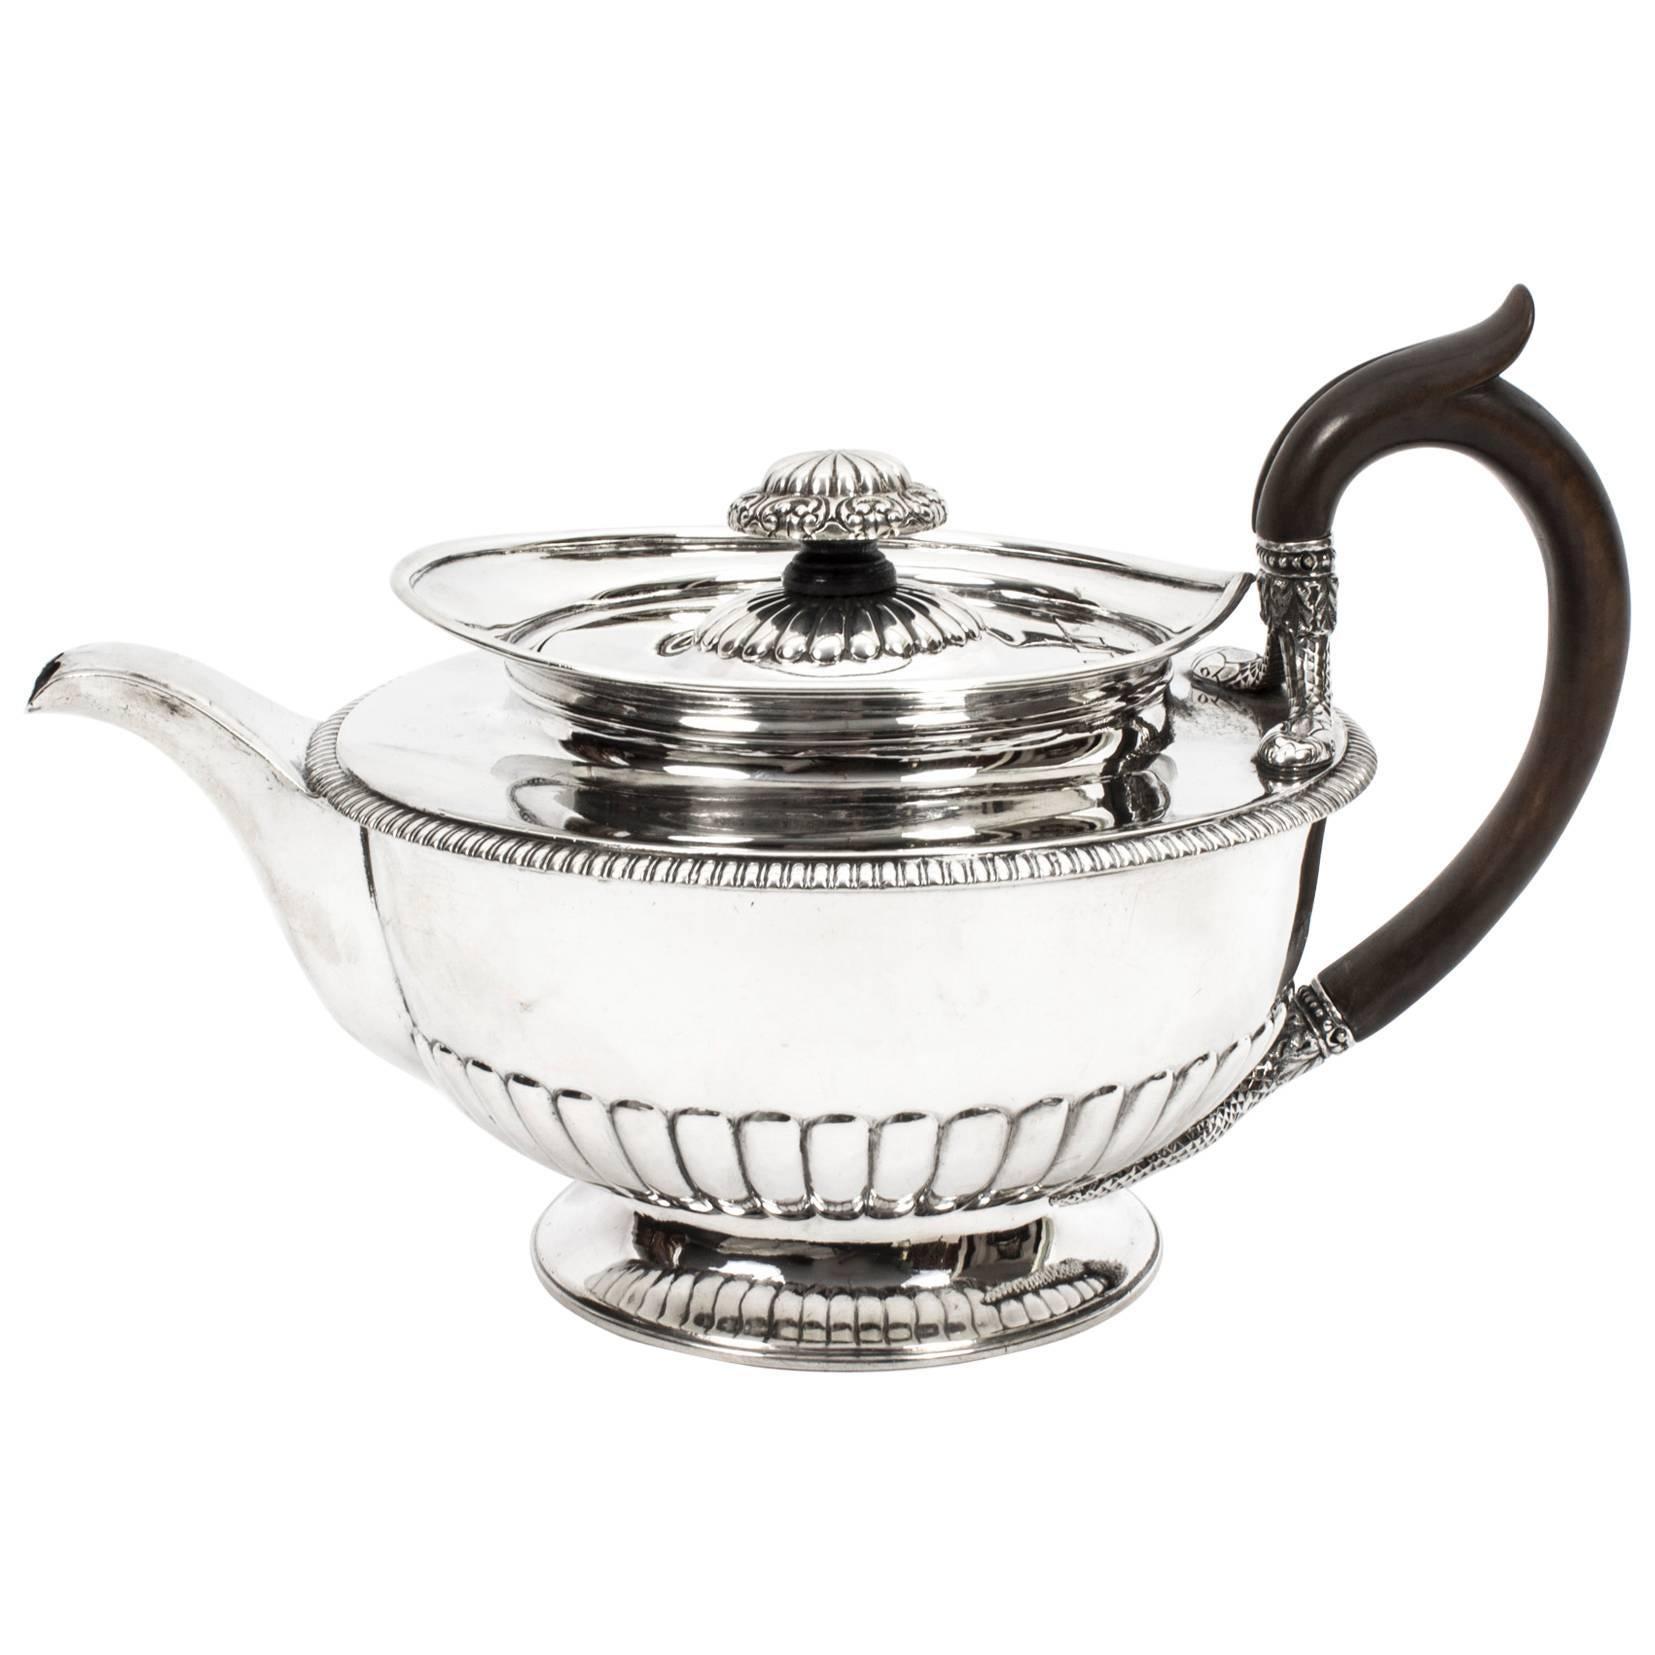 Antique Sterling Silver Teapot Paul Storr, 1809